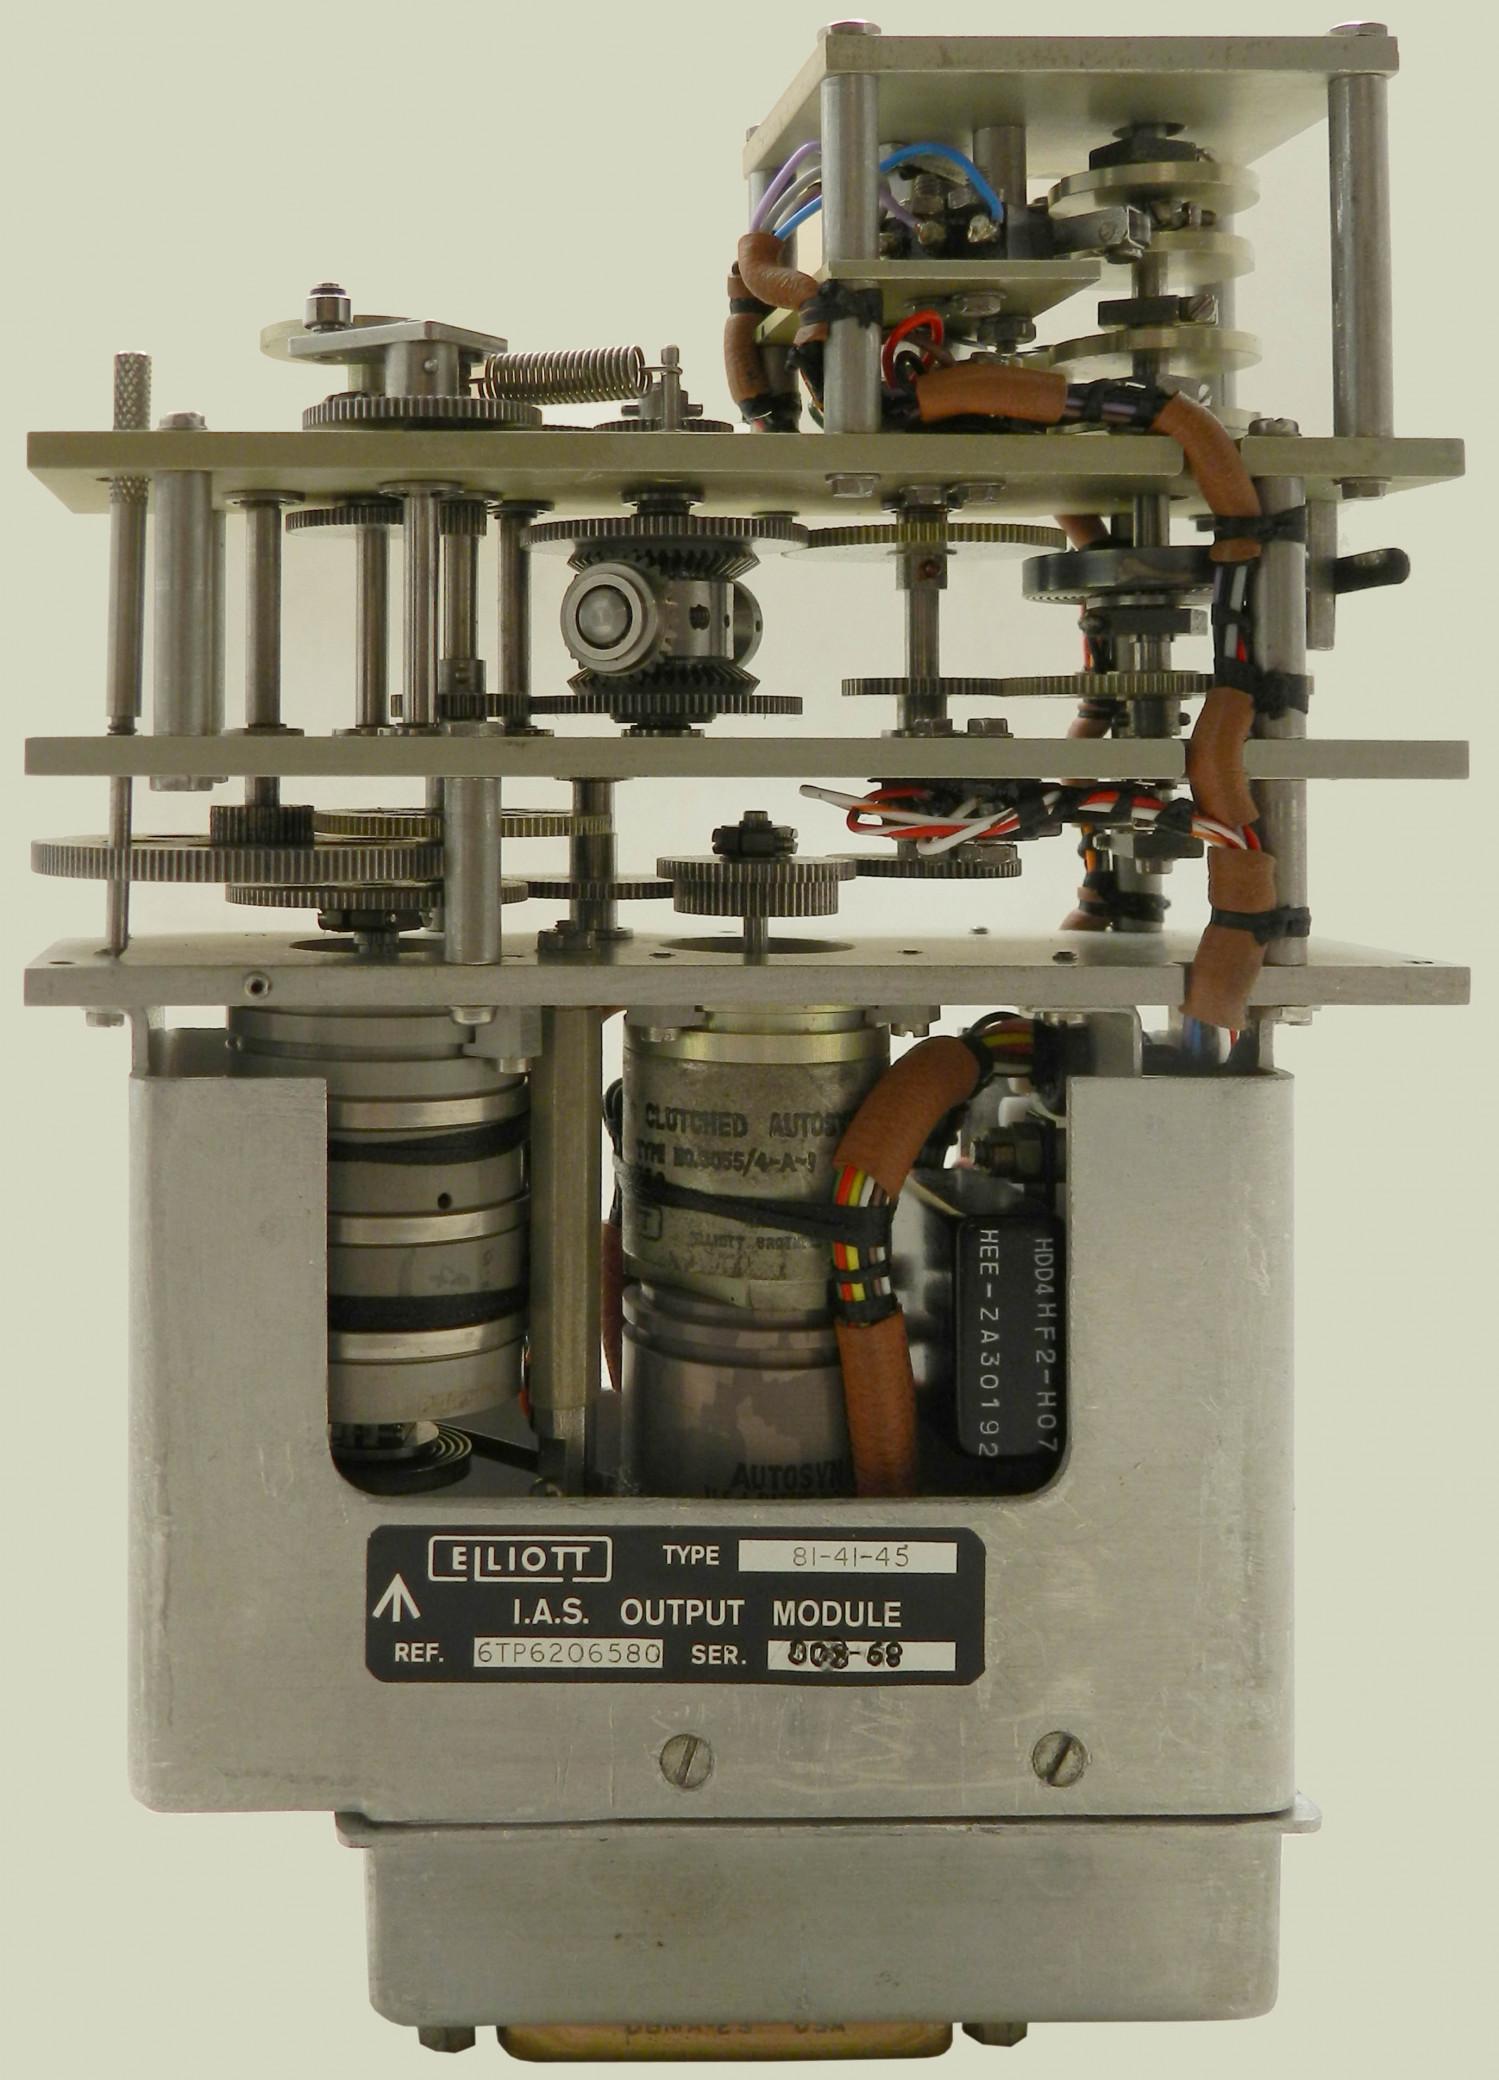 I.A.S. Output Module